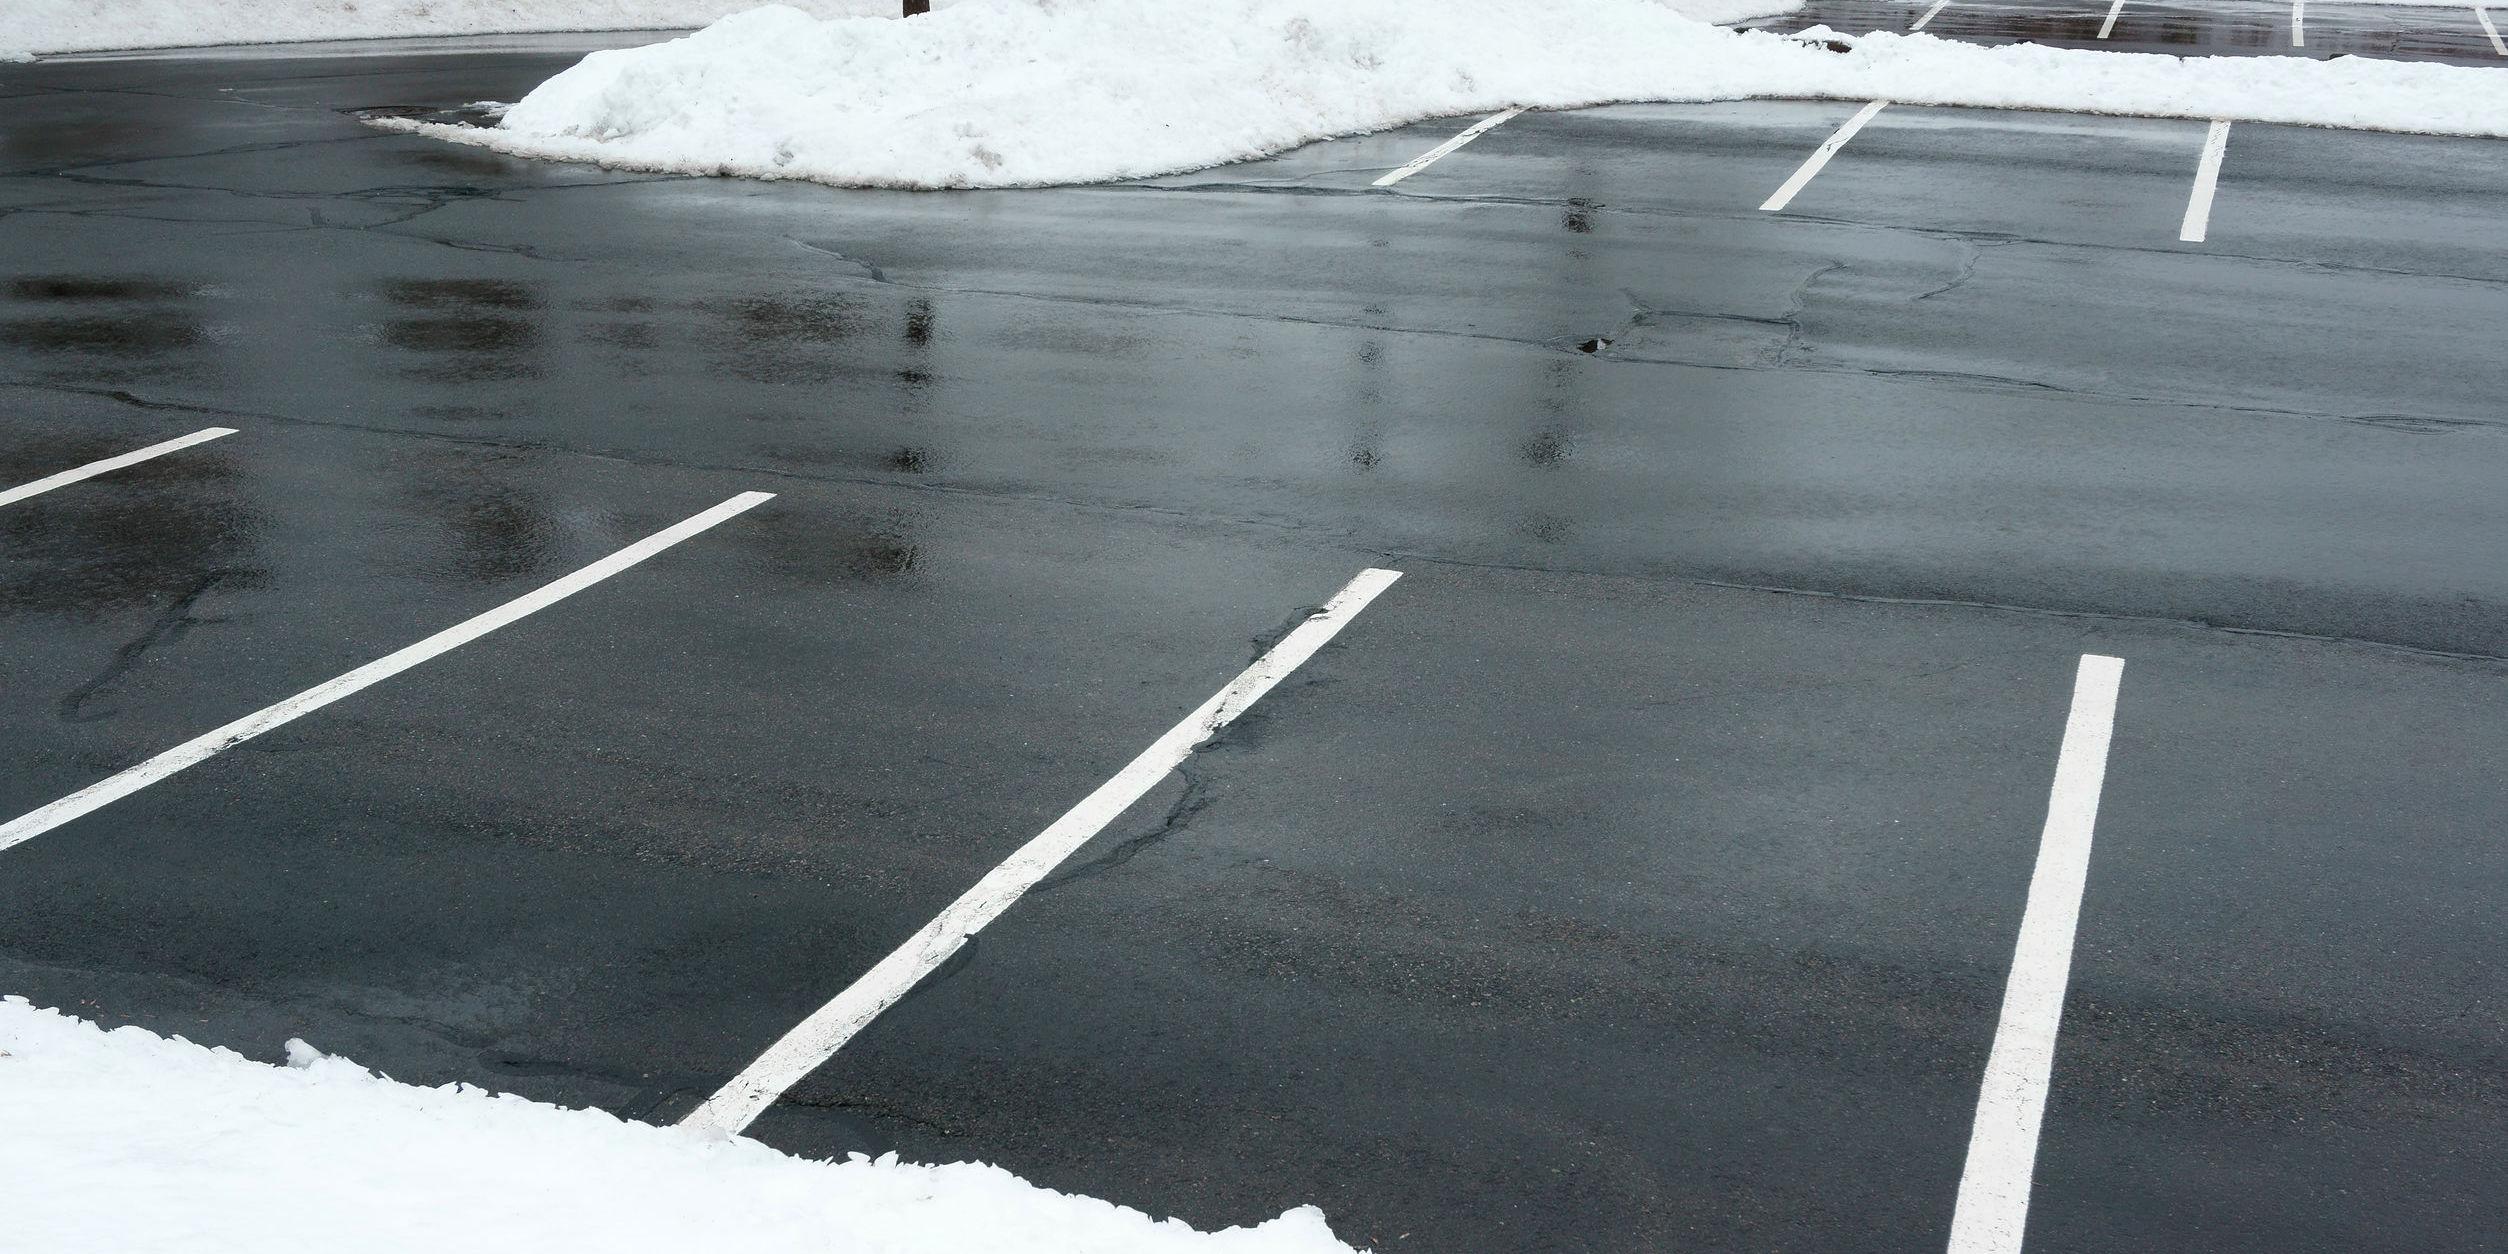 parking lot maintenance